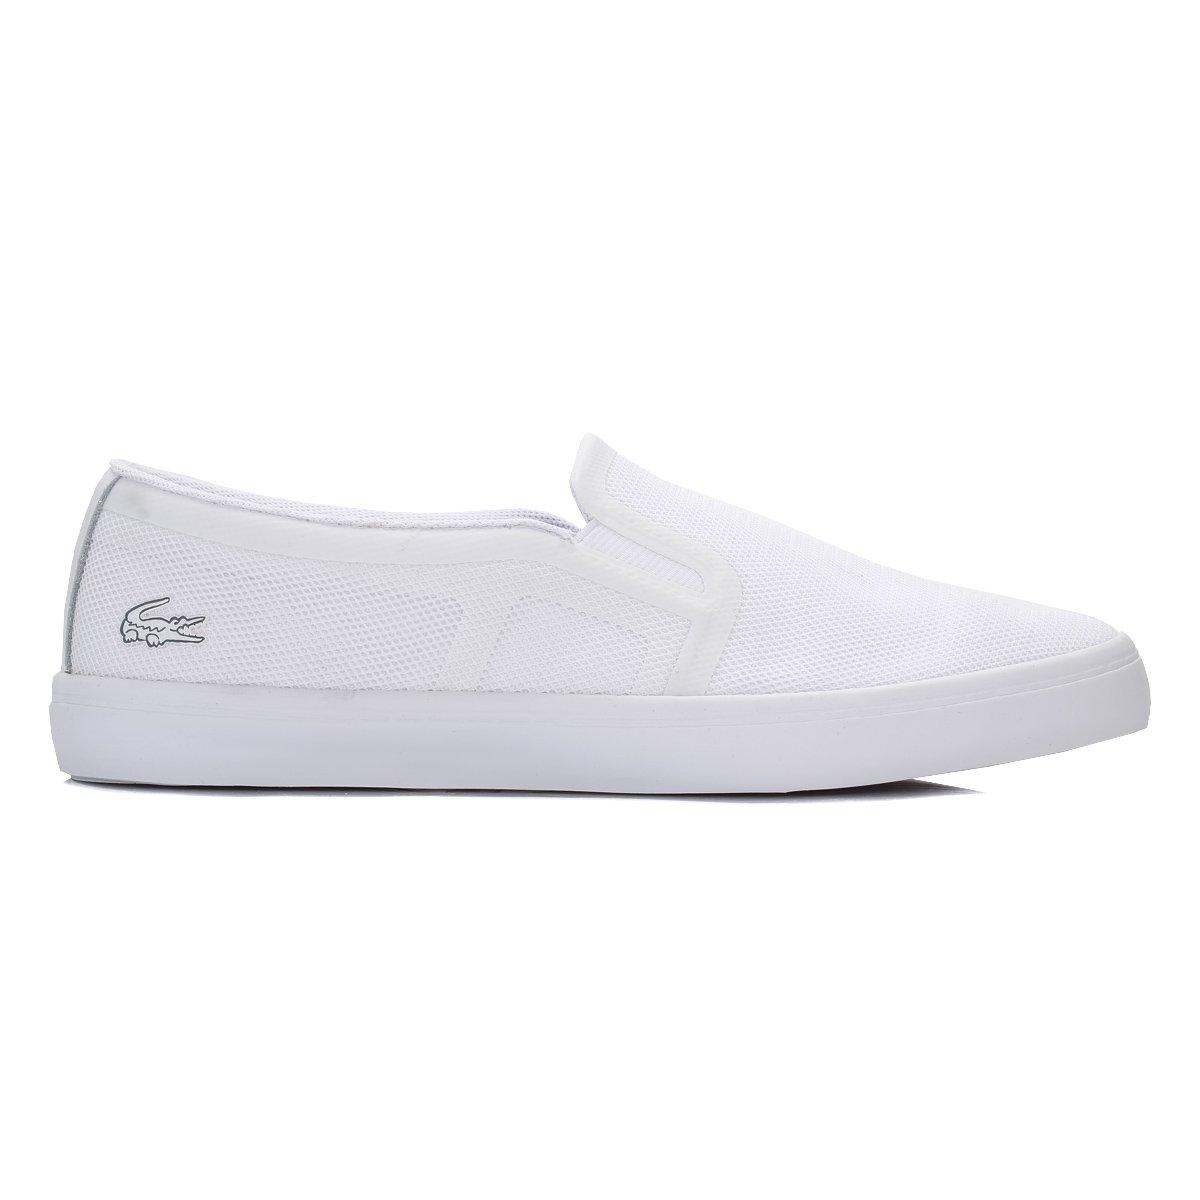 2481fbcb9 Lacoste Womens Gazon Slip On 116 Lightweight White Plimsolls Trainers -  White - 8  Amazon.co.uk  Shoes   Bags